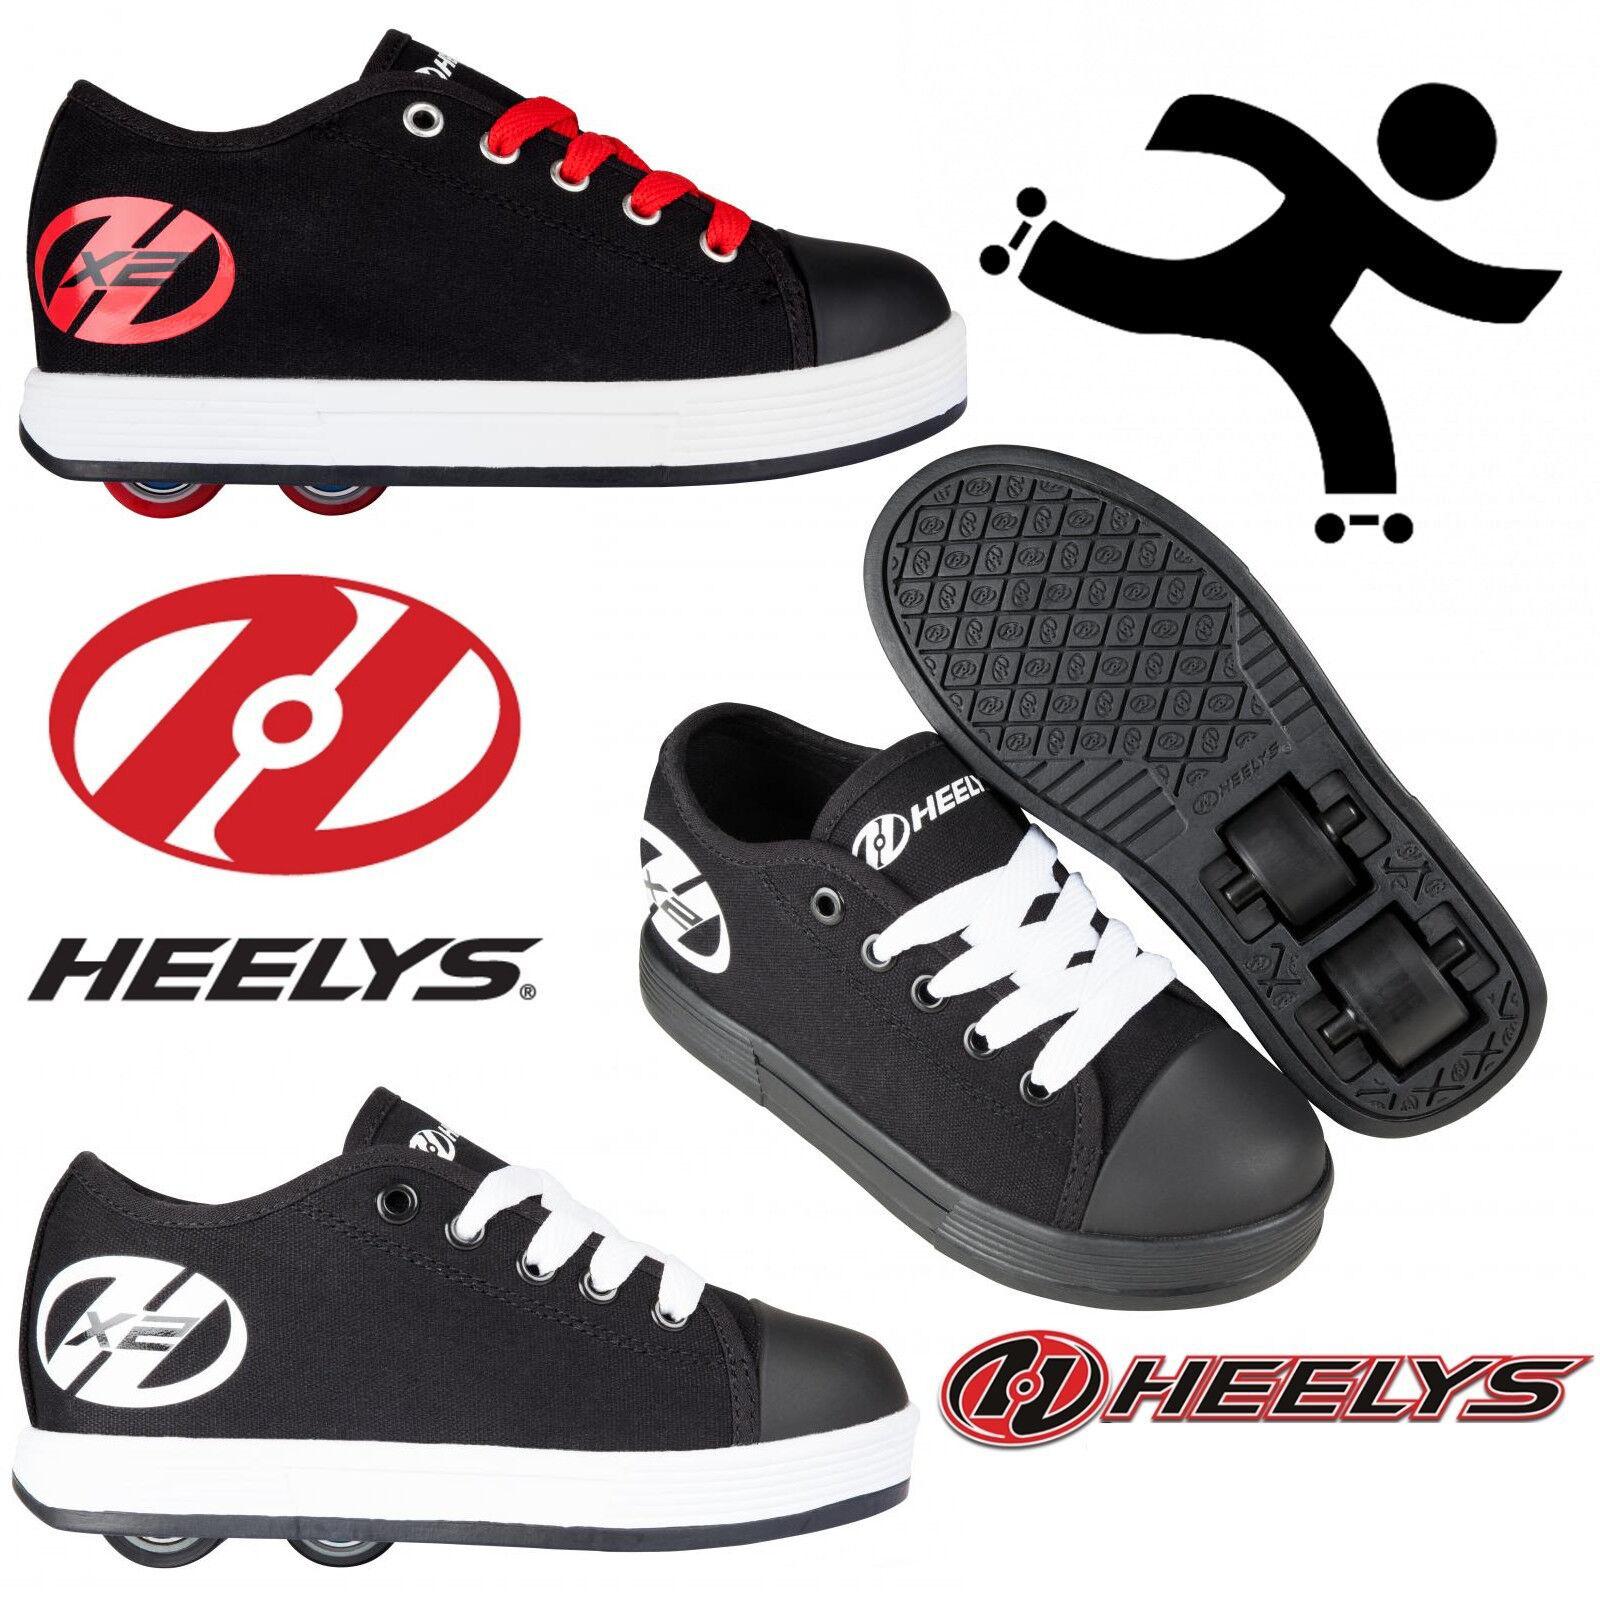 New Heelys Fresh Kids Wheelie Trainers